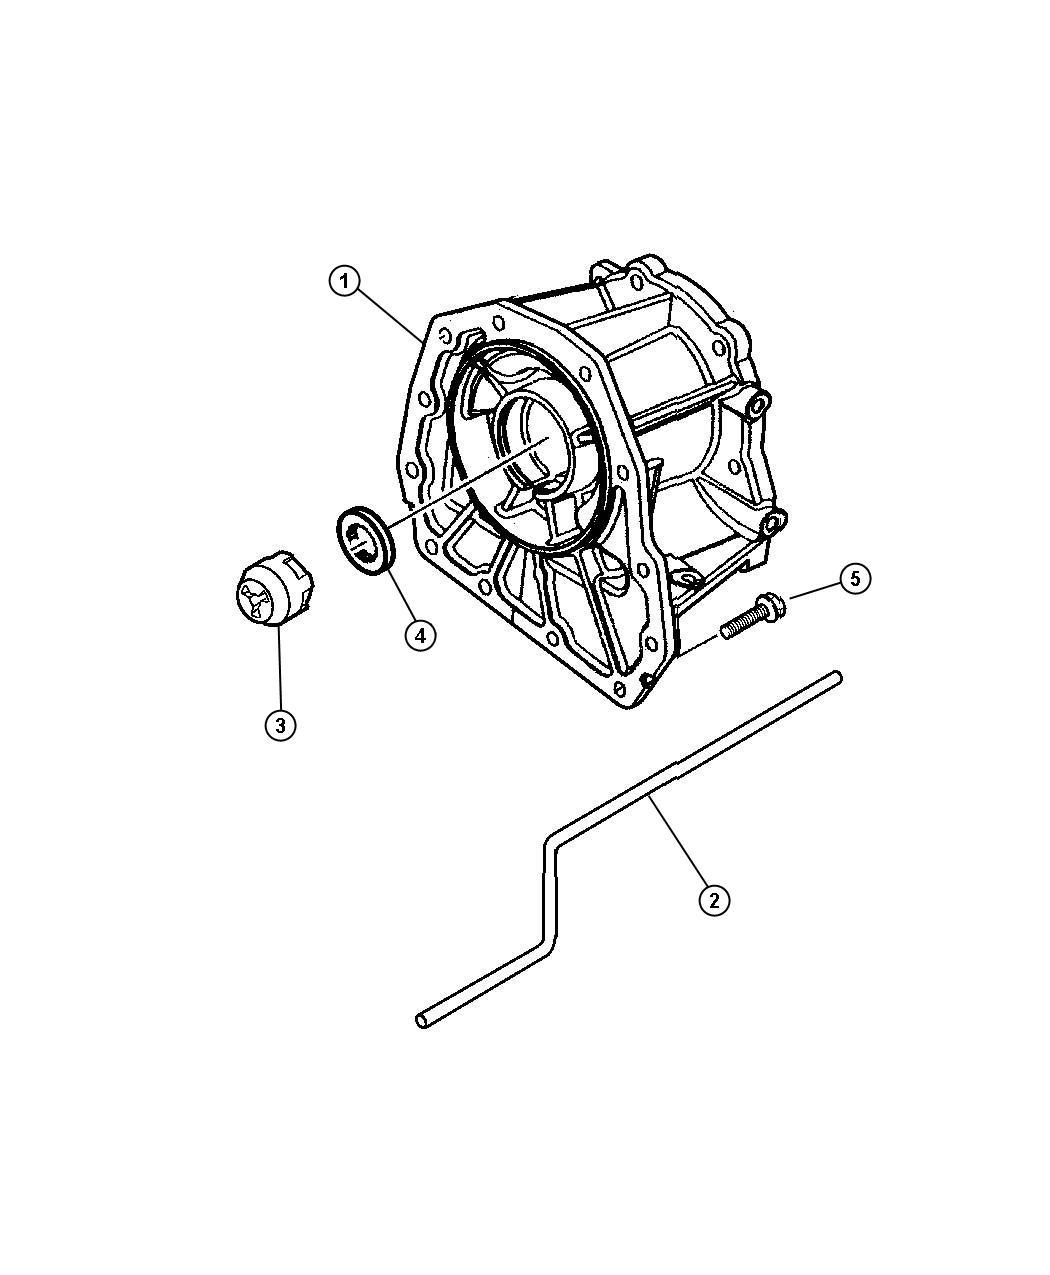 Dodge Dakota Adapter Transfer Case Transmission